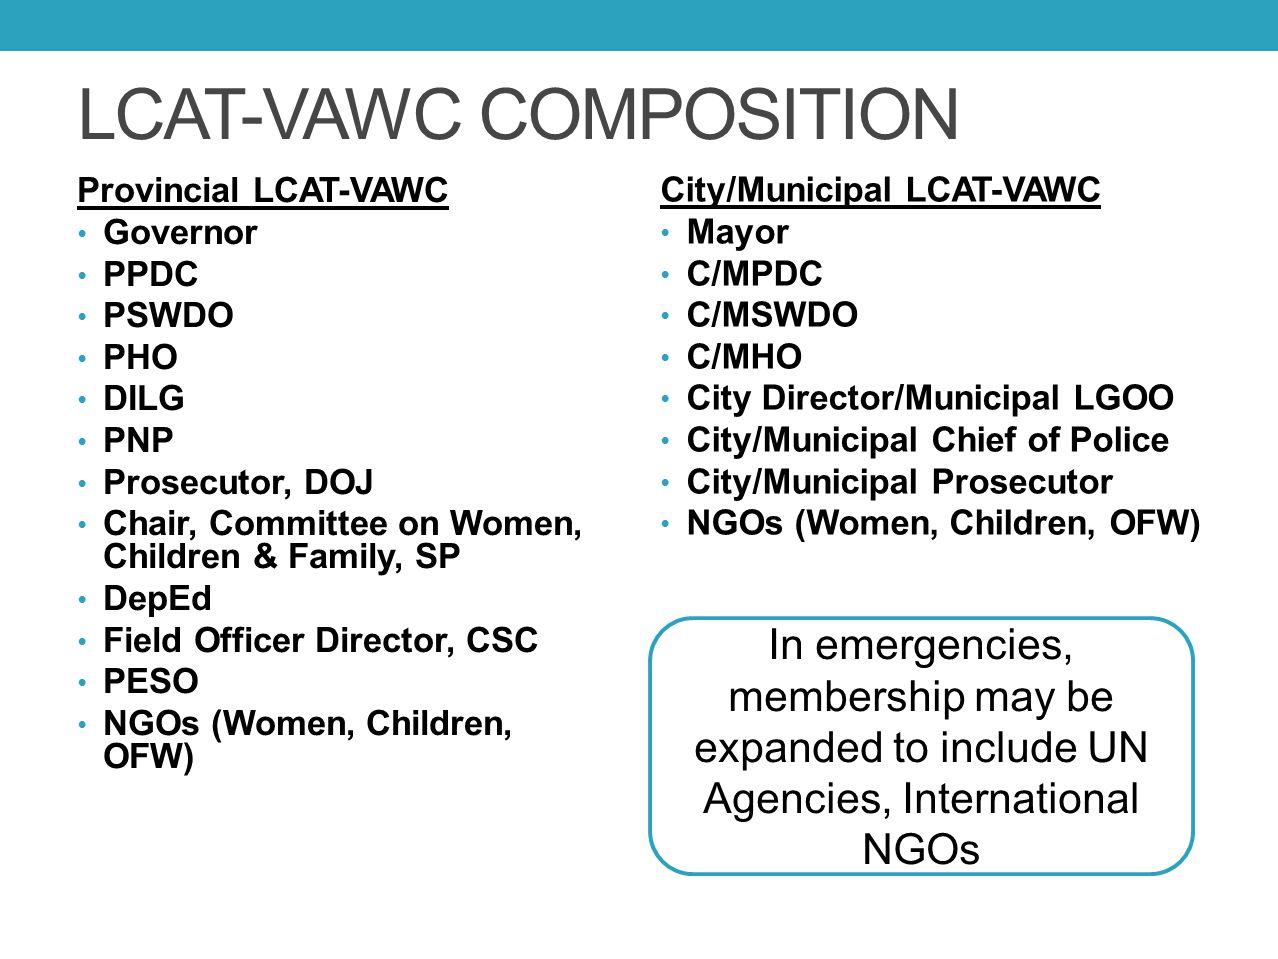 LCAT-VAWC COMPOSITION Provincial LCAT-VAWC Governor PPDC PSWDO PHO DILG PNP Prosecutor, DOJ Chair, Committee on Women, Children & Family, SP DepEd Fie